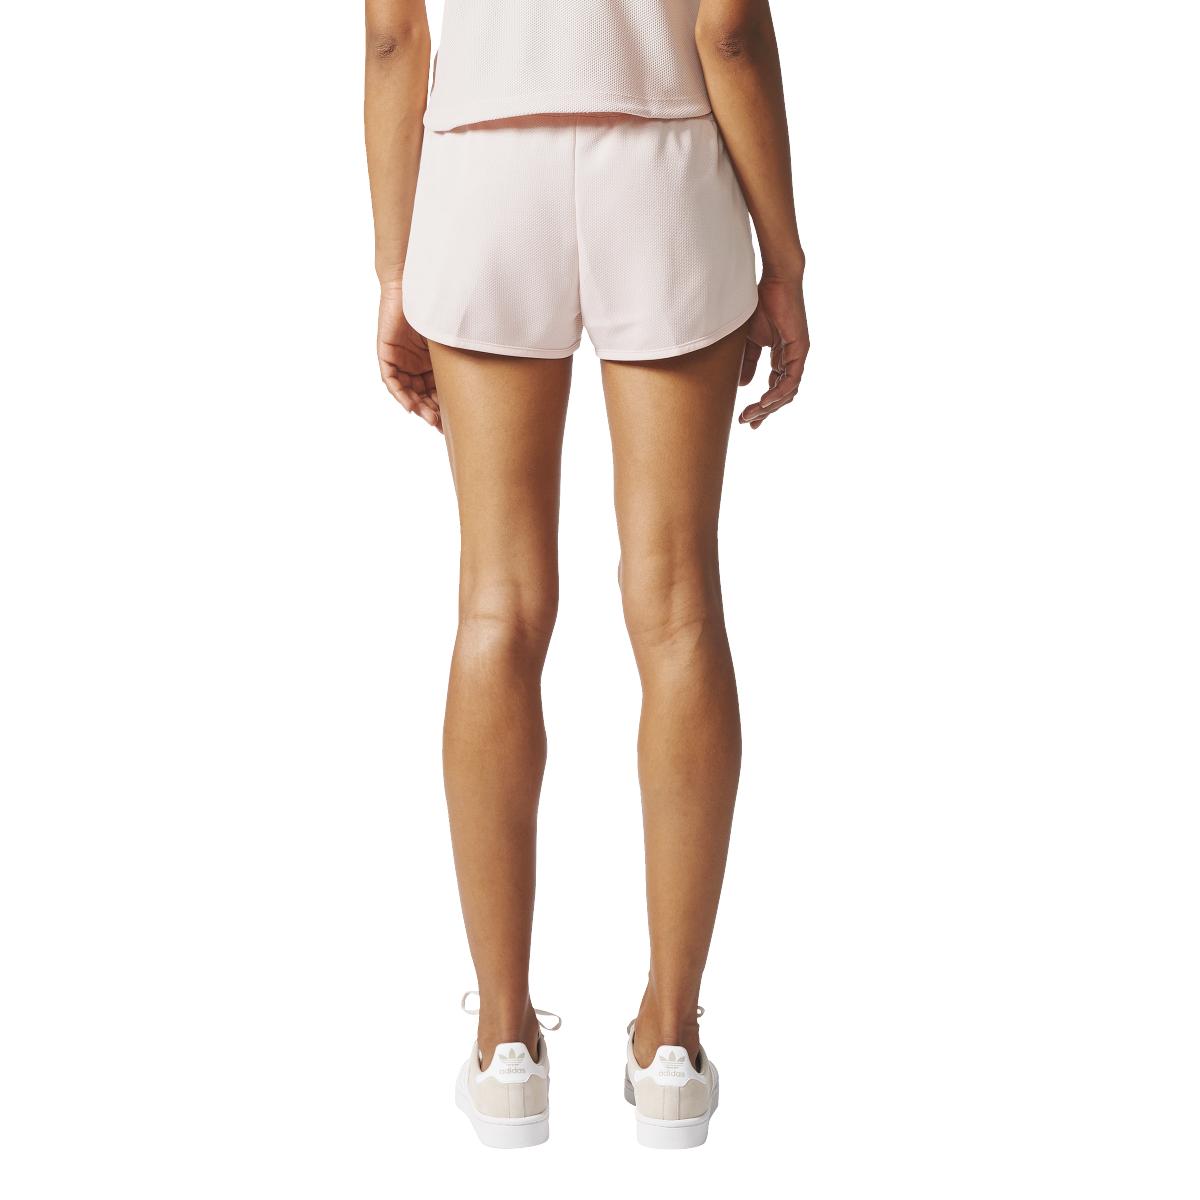 adidas originals reguklar shorts damen hose pink bp9426 sport klingenmaier. Black Bedroom Furniture Sets. Home Design Ideas